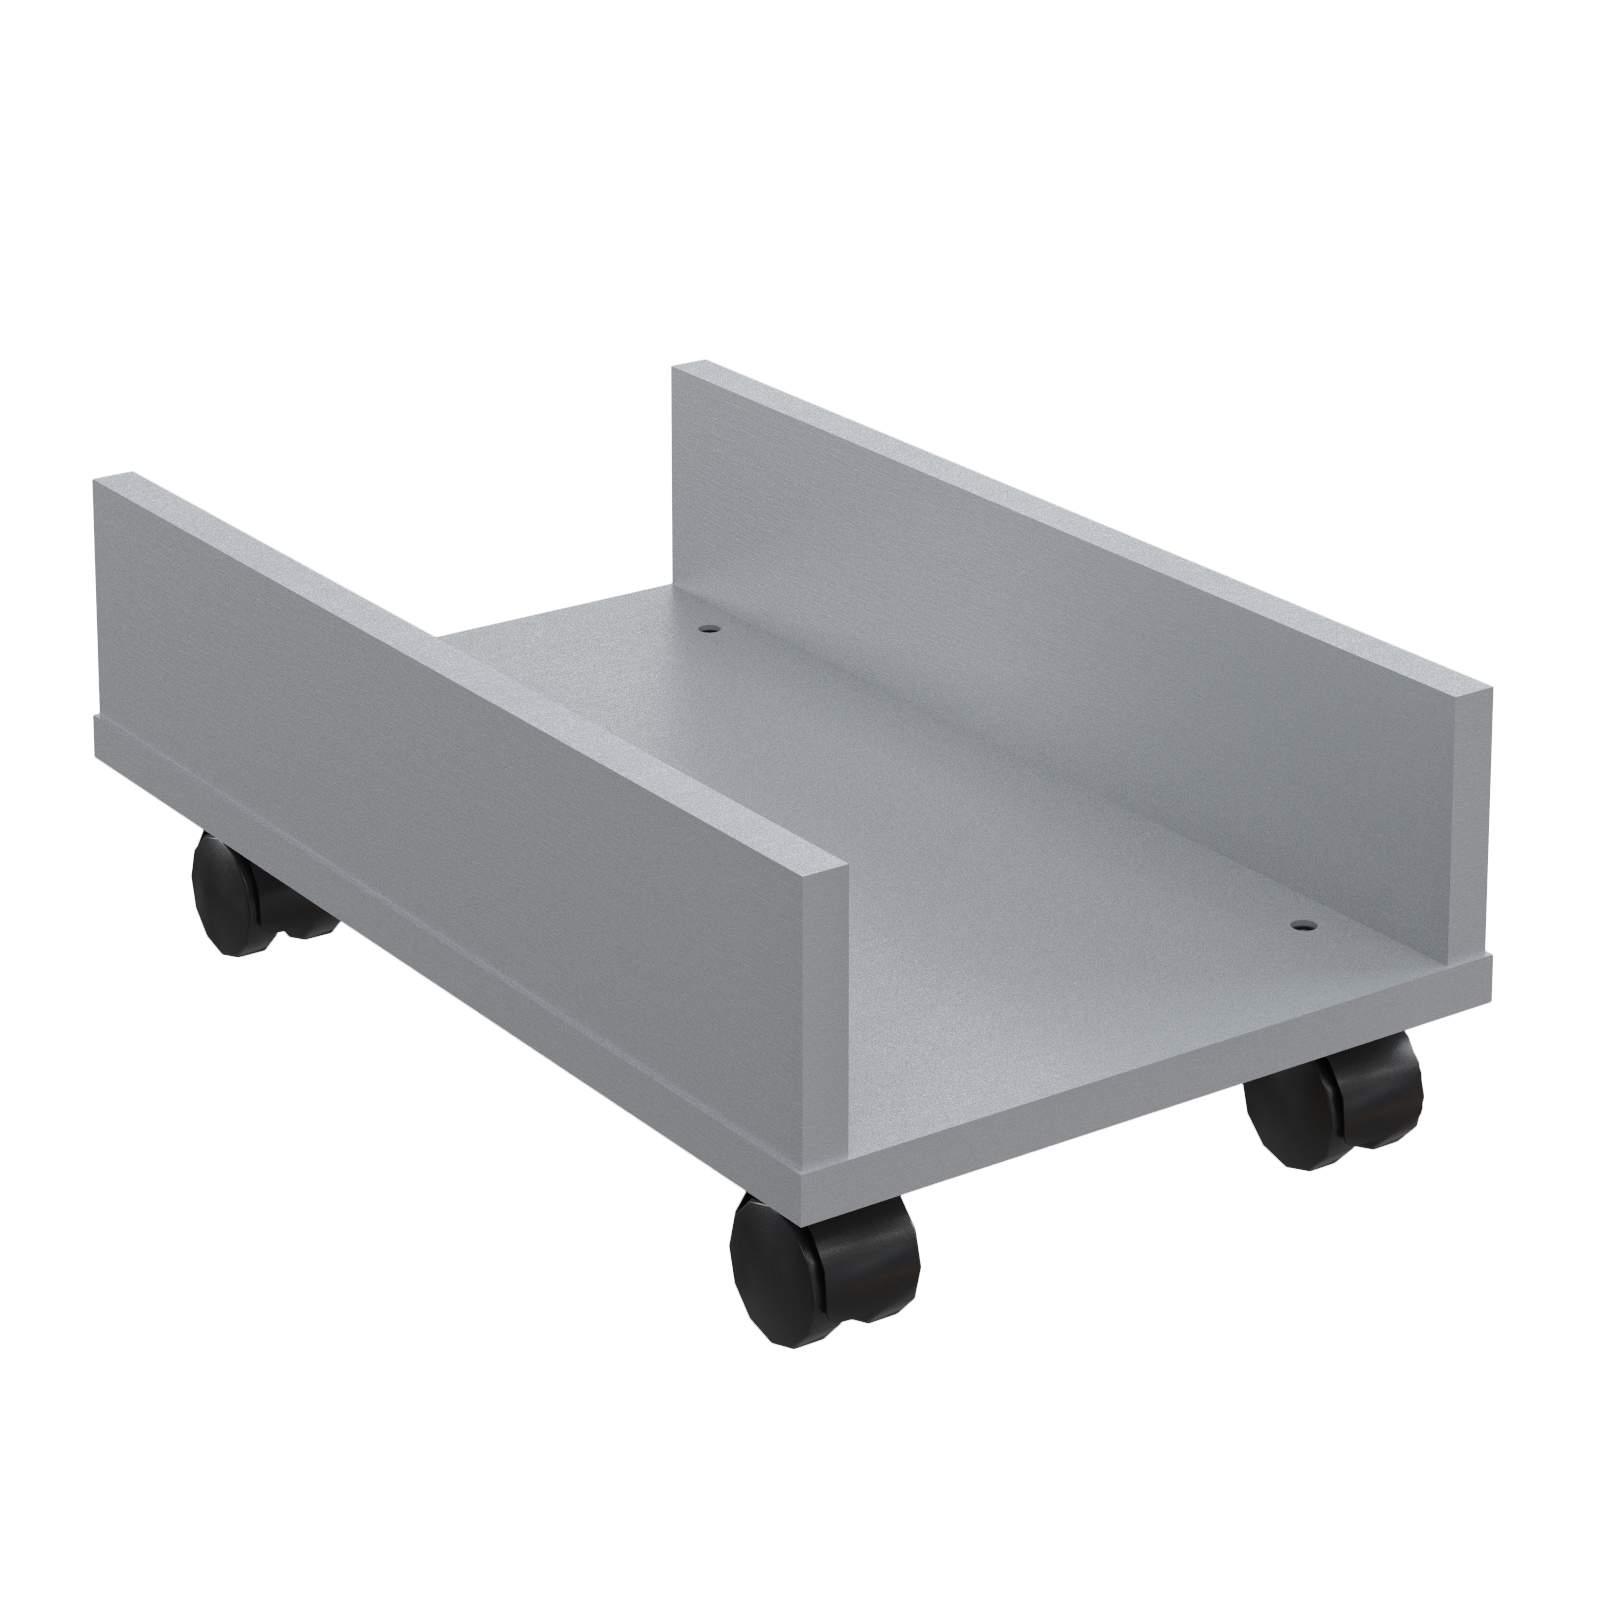 Подставка под системный блок 500х300х181